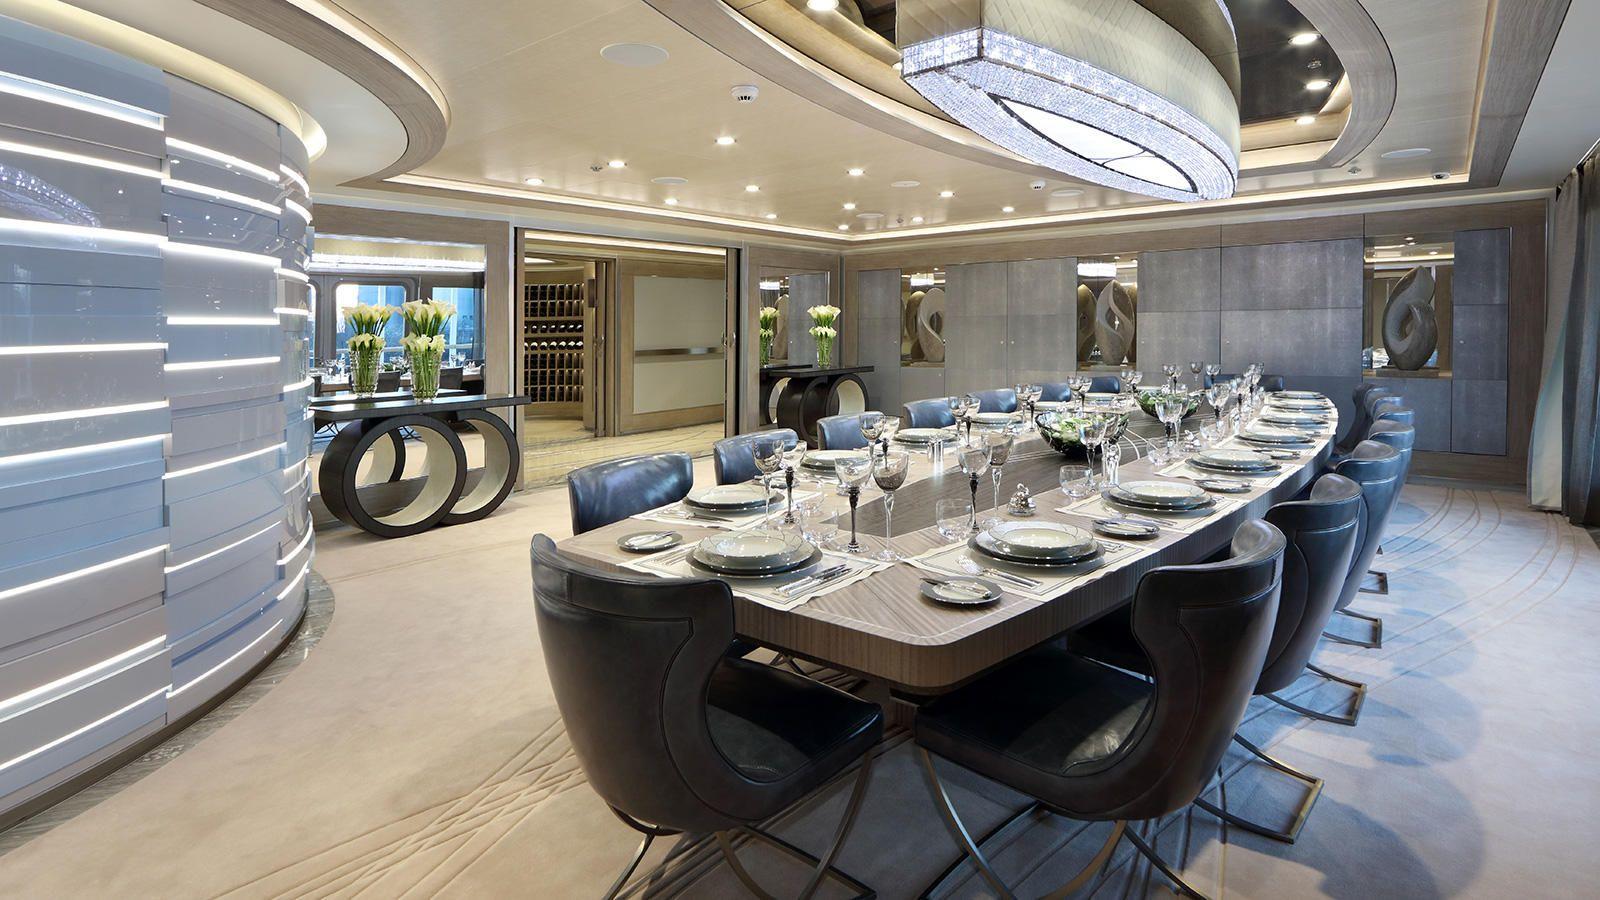 M6Ktingfq2Sb75Qmw1Zj_Ulyssessuperyachtkleven107Metresdining Glamorous 107 Dining Room Decorating Inspiration